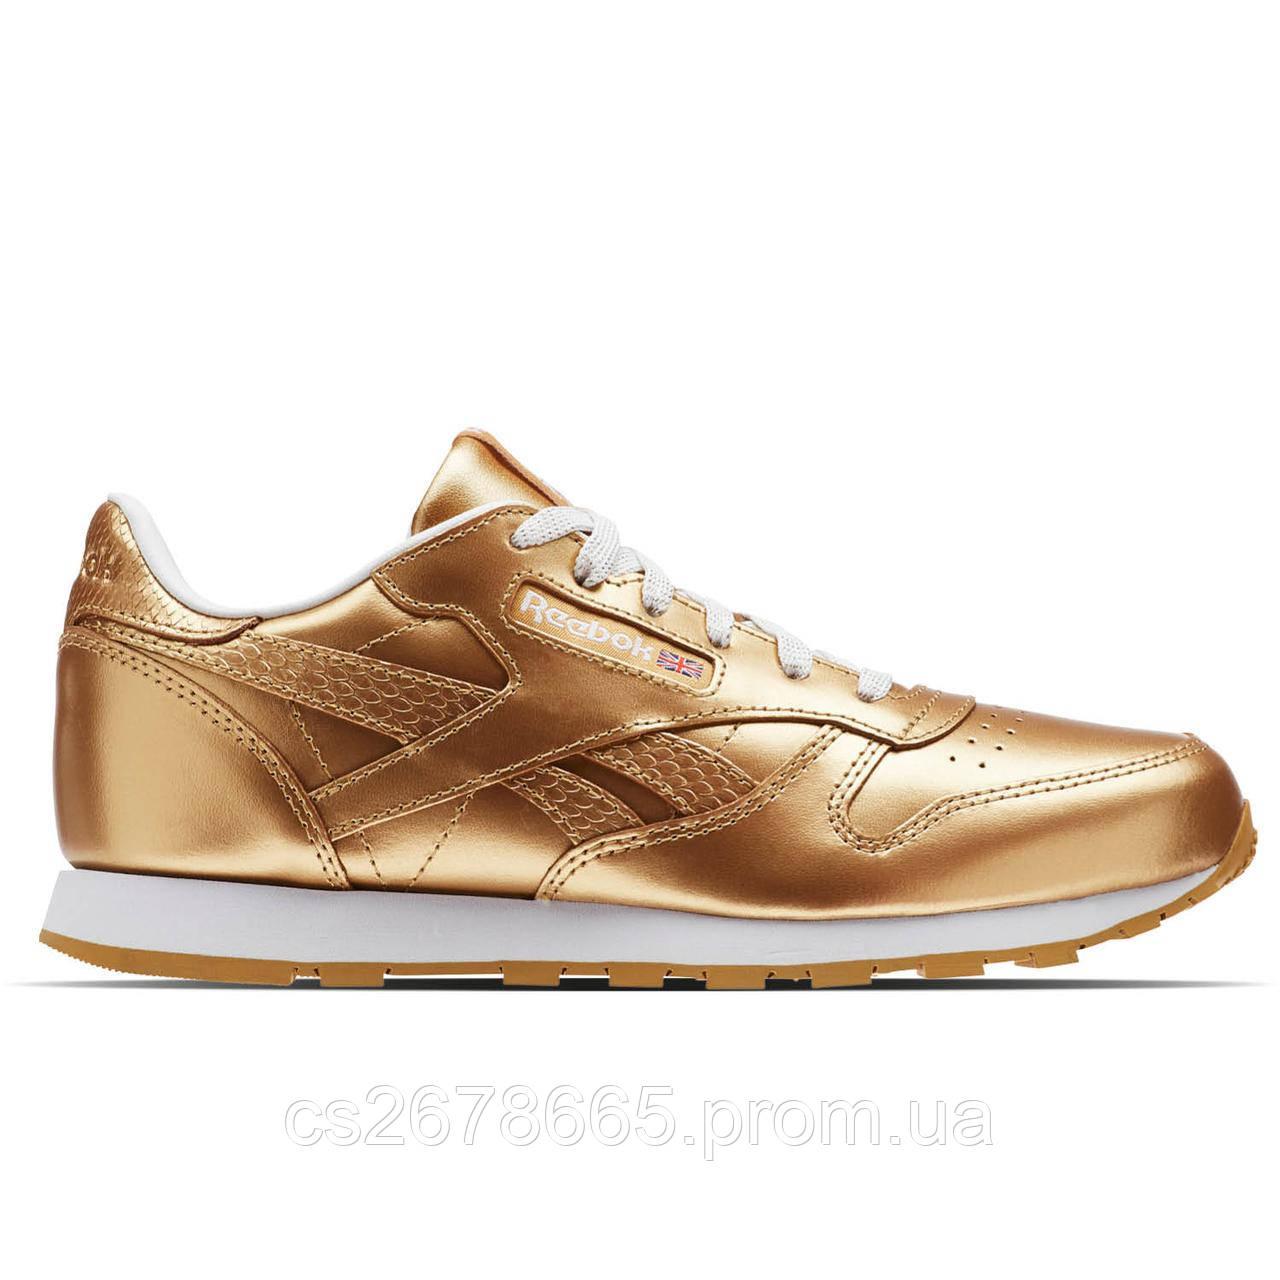 Женские кроссовки Reebok Classic Leather Metallic Gold BS8944